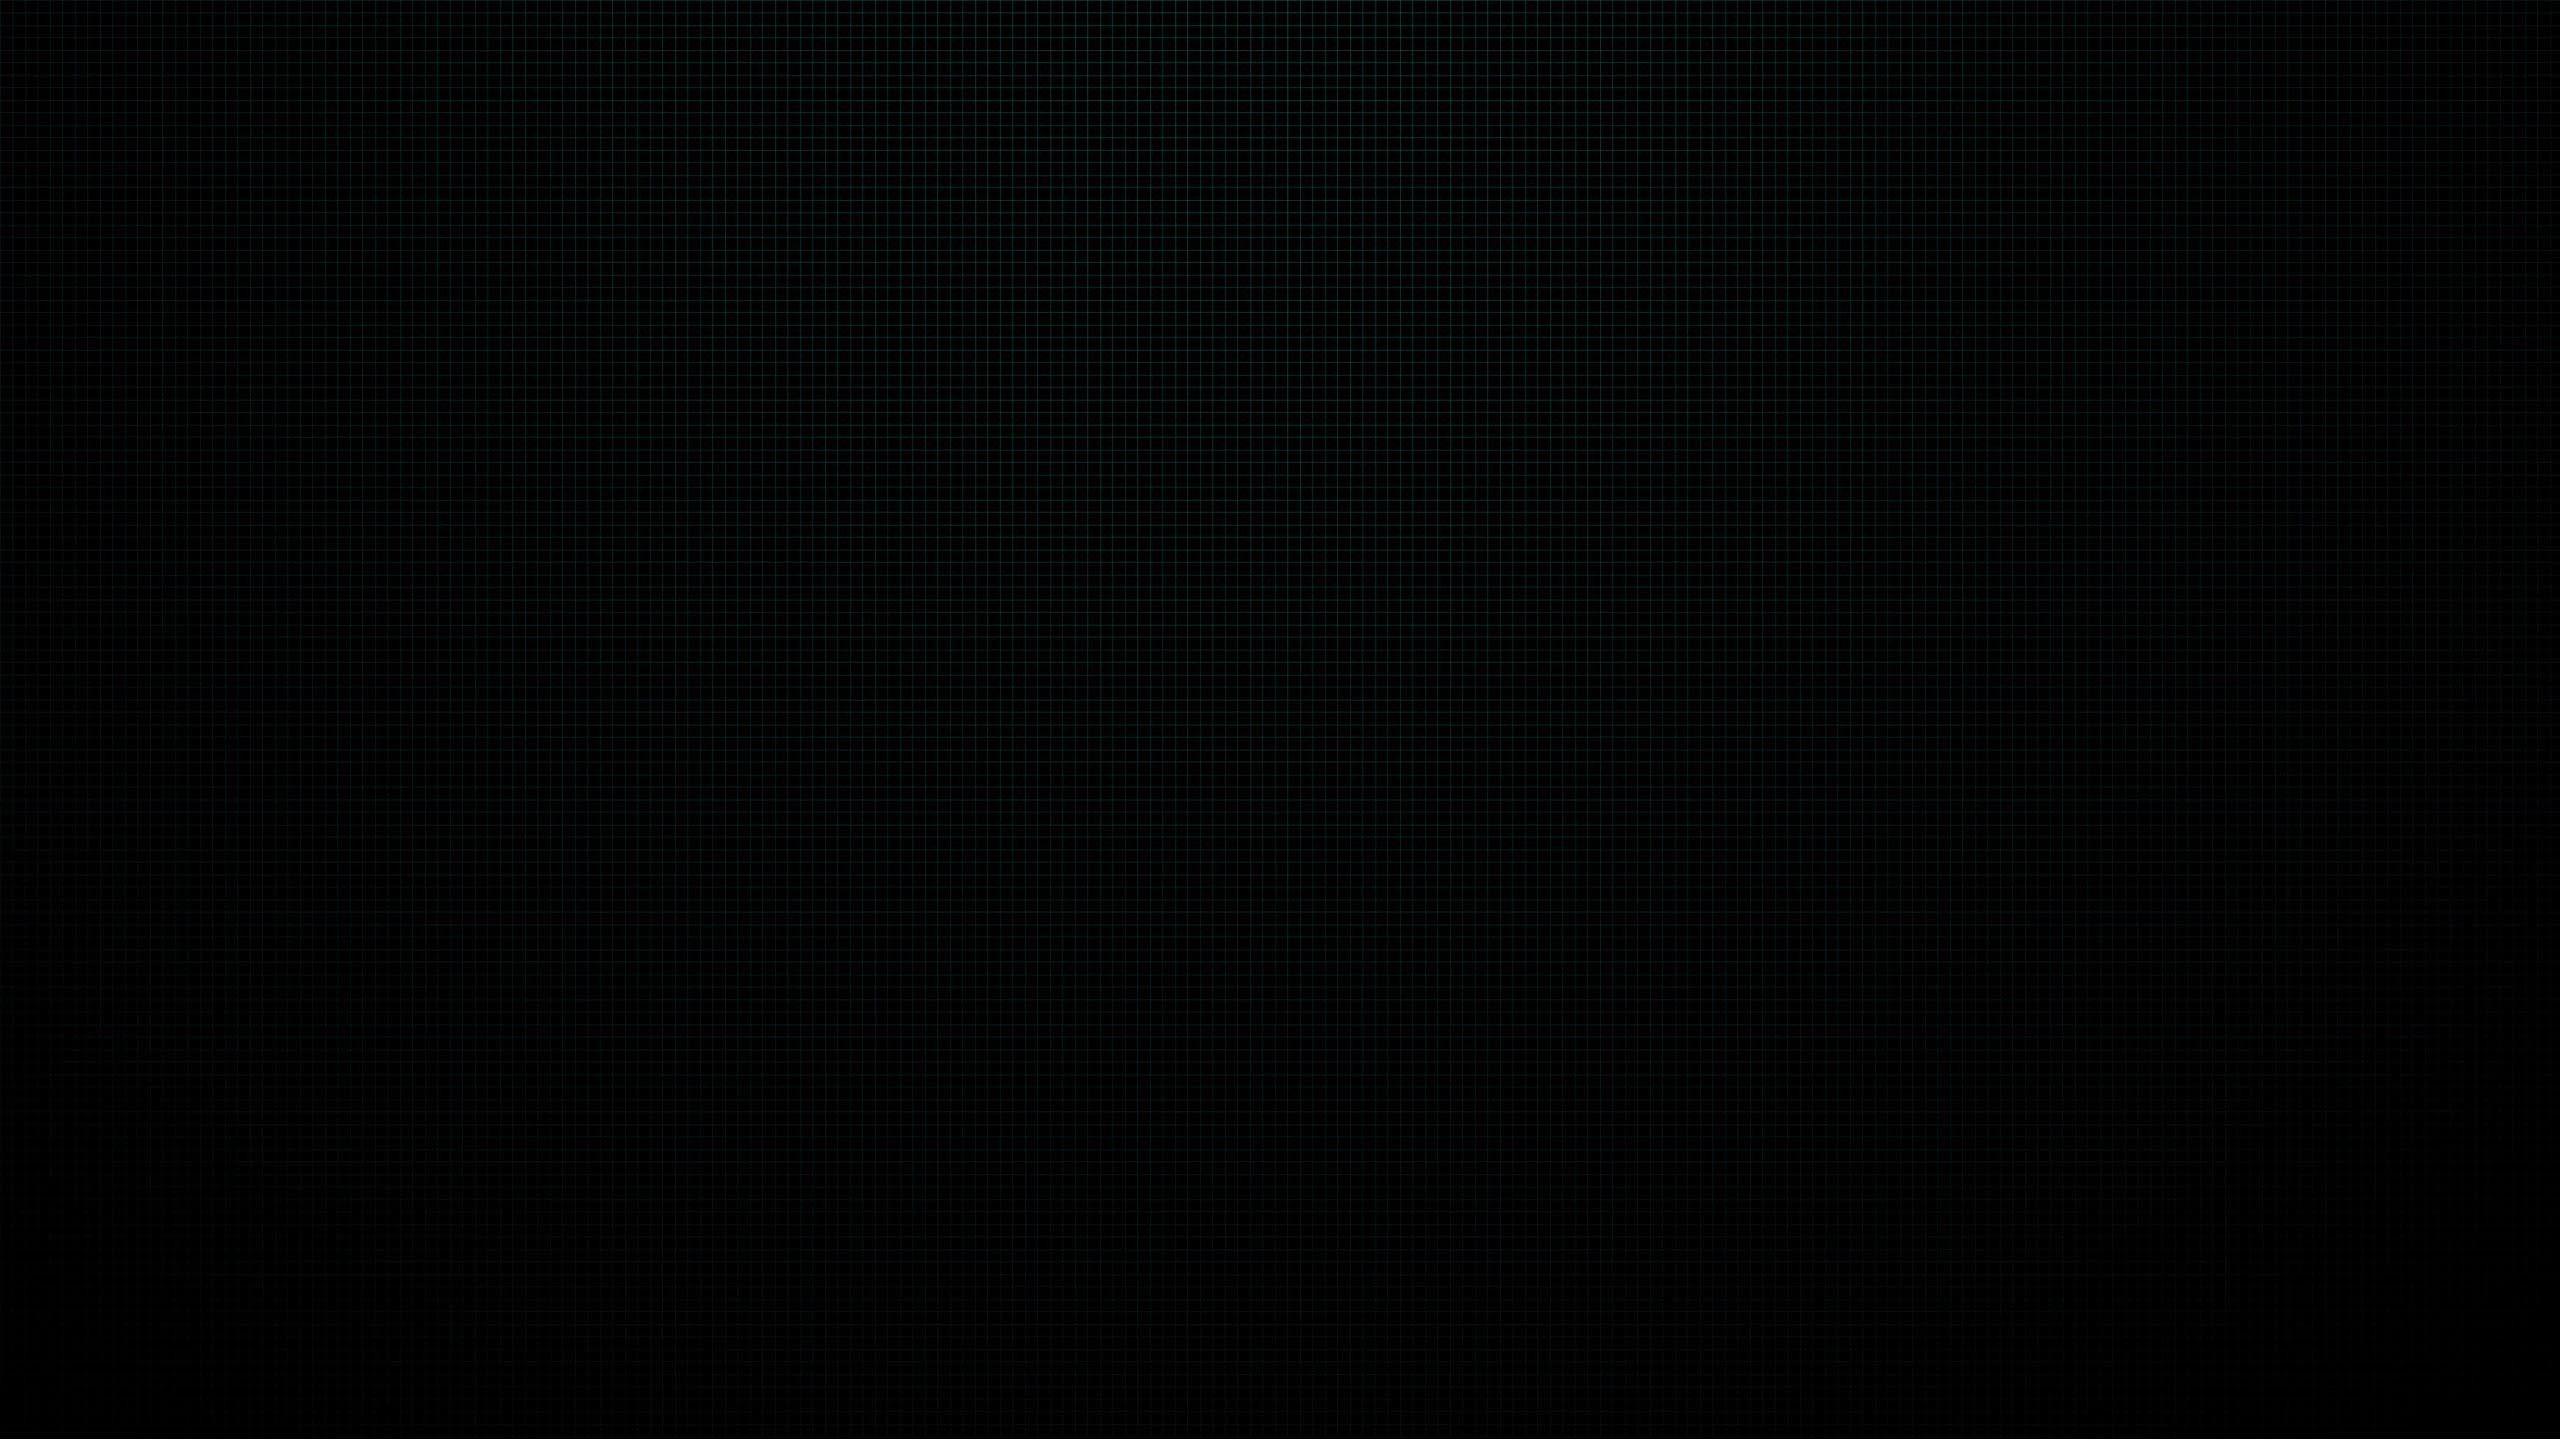 Ultra HD Black Wallpapers - Top Free Ultra HD Black ...